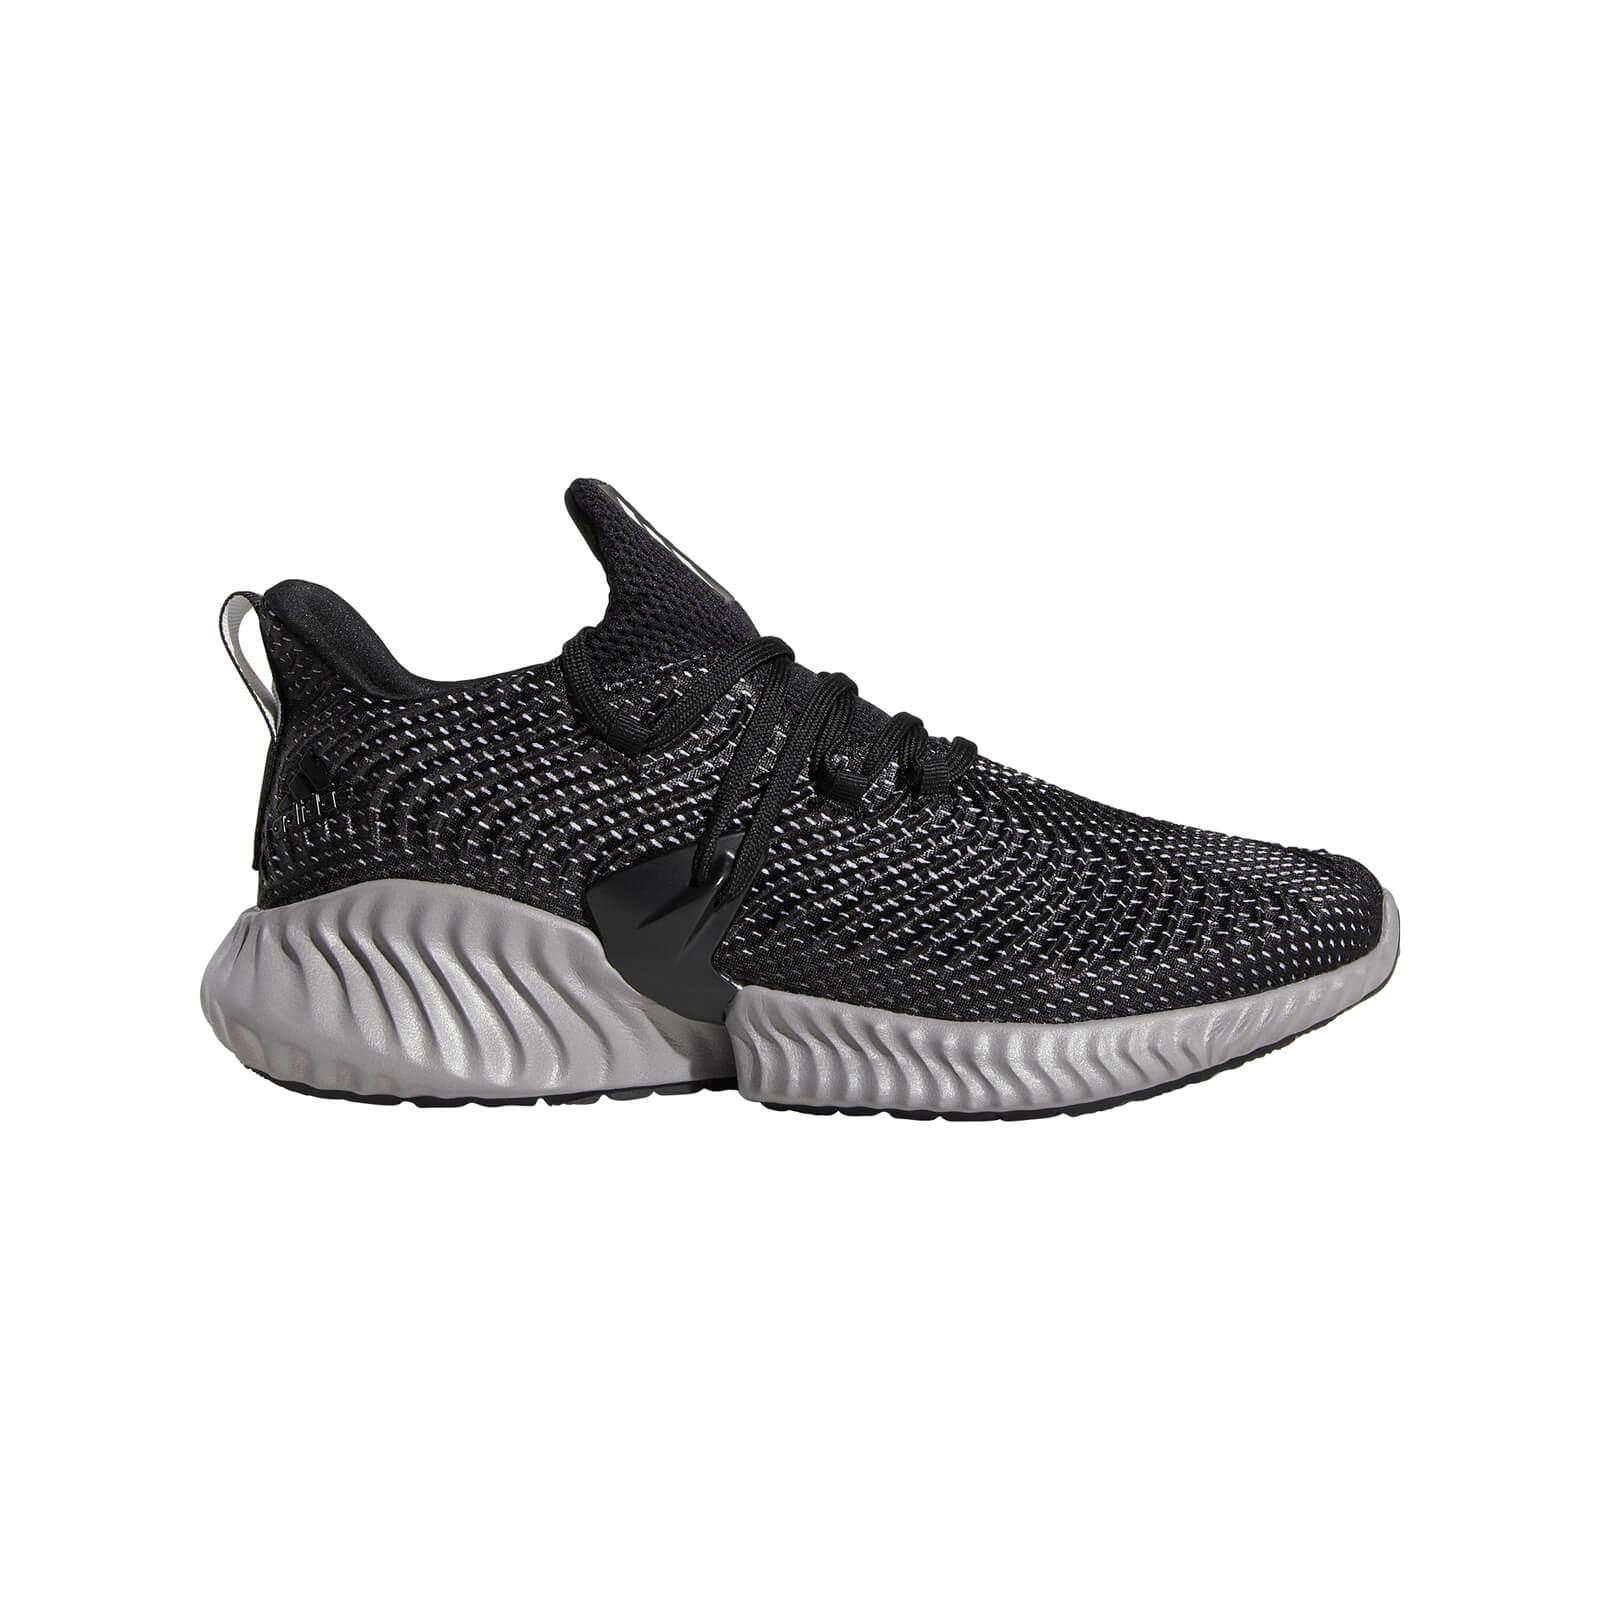 adidas Men's Alphabounce Instinct Running Shoes - Black - US 10/UK 9.5 - Black